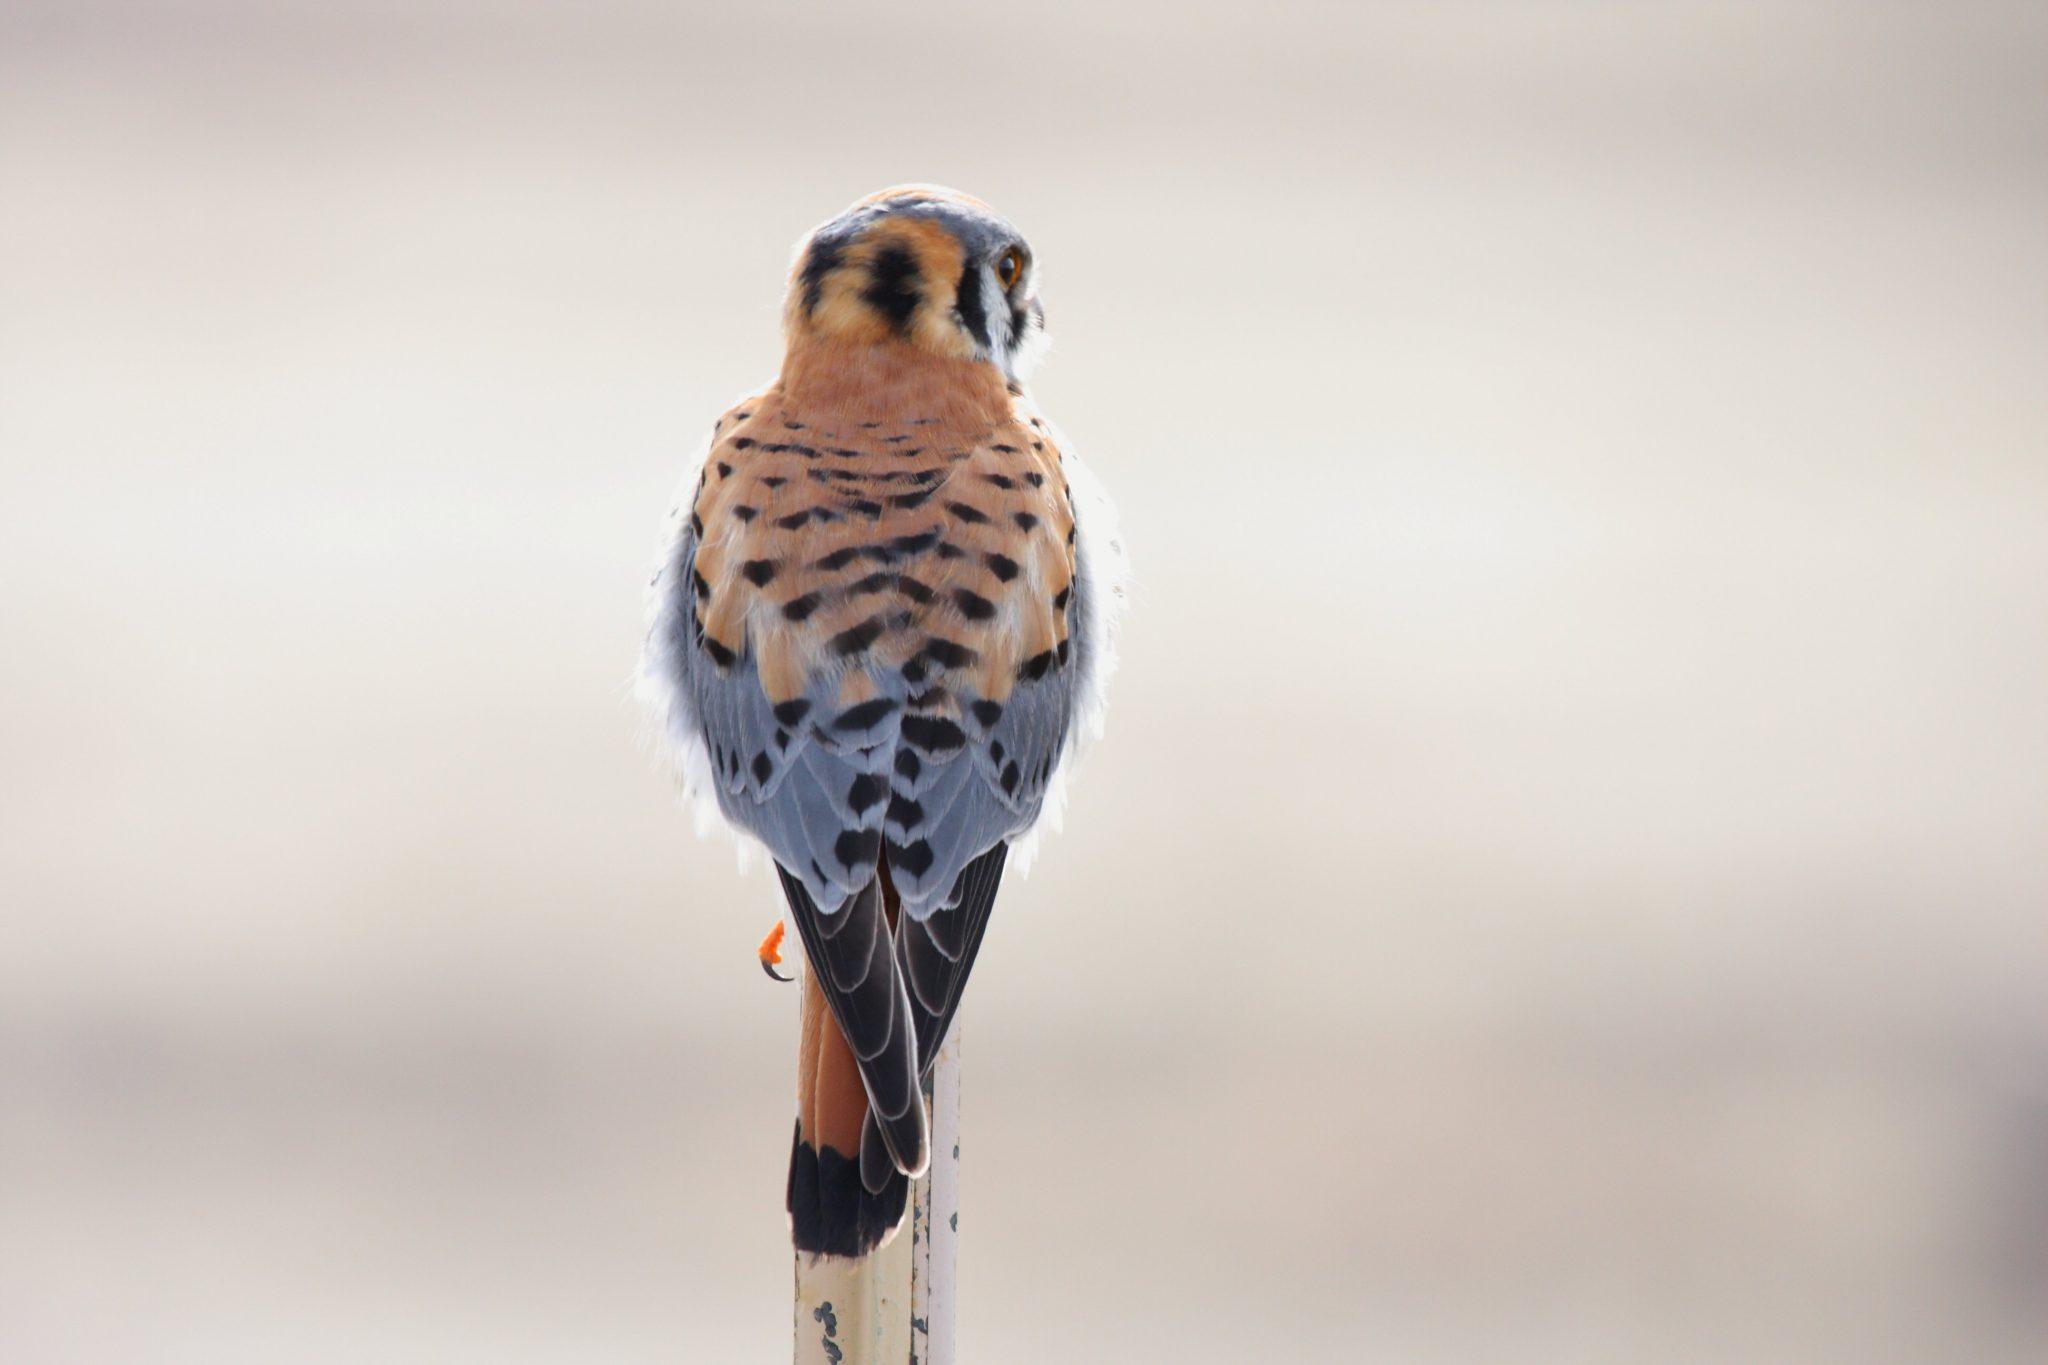 American_Kestrel_(Falco_sparverius)_(4411675713)